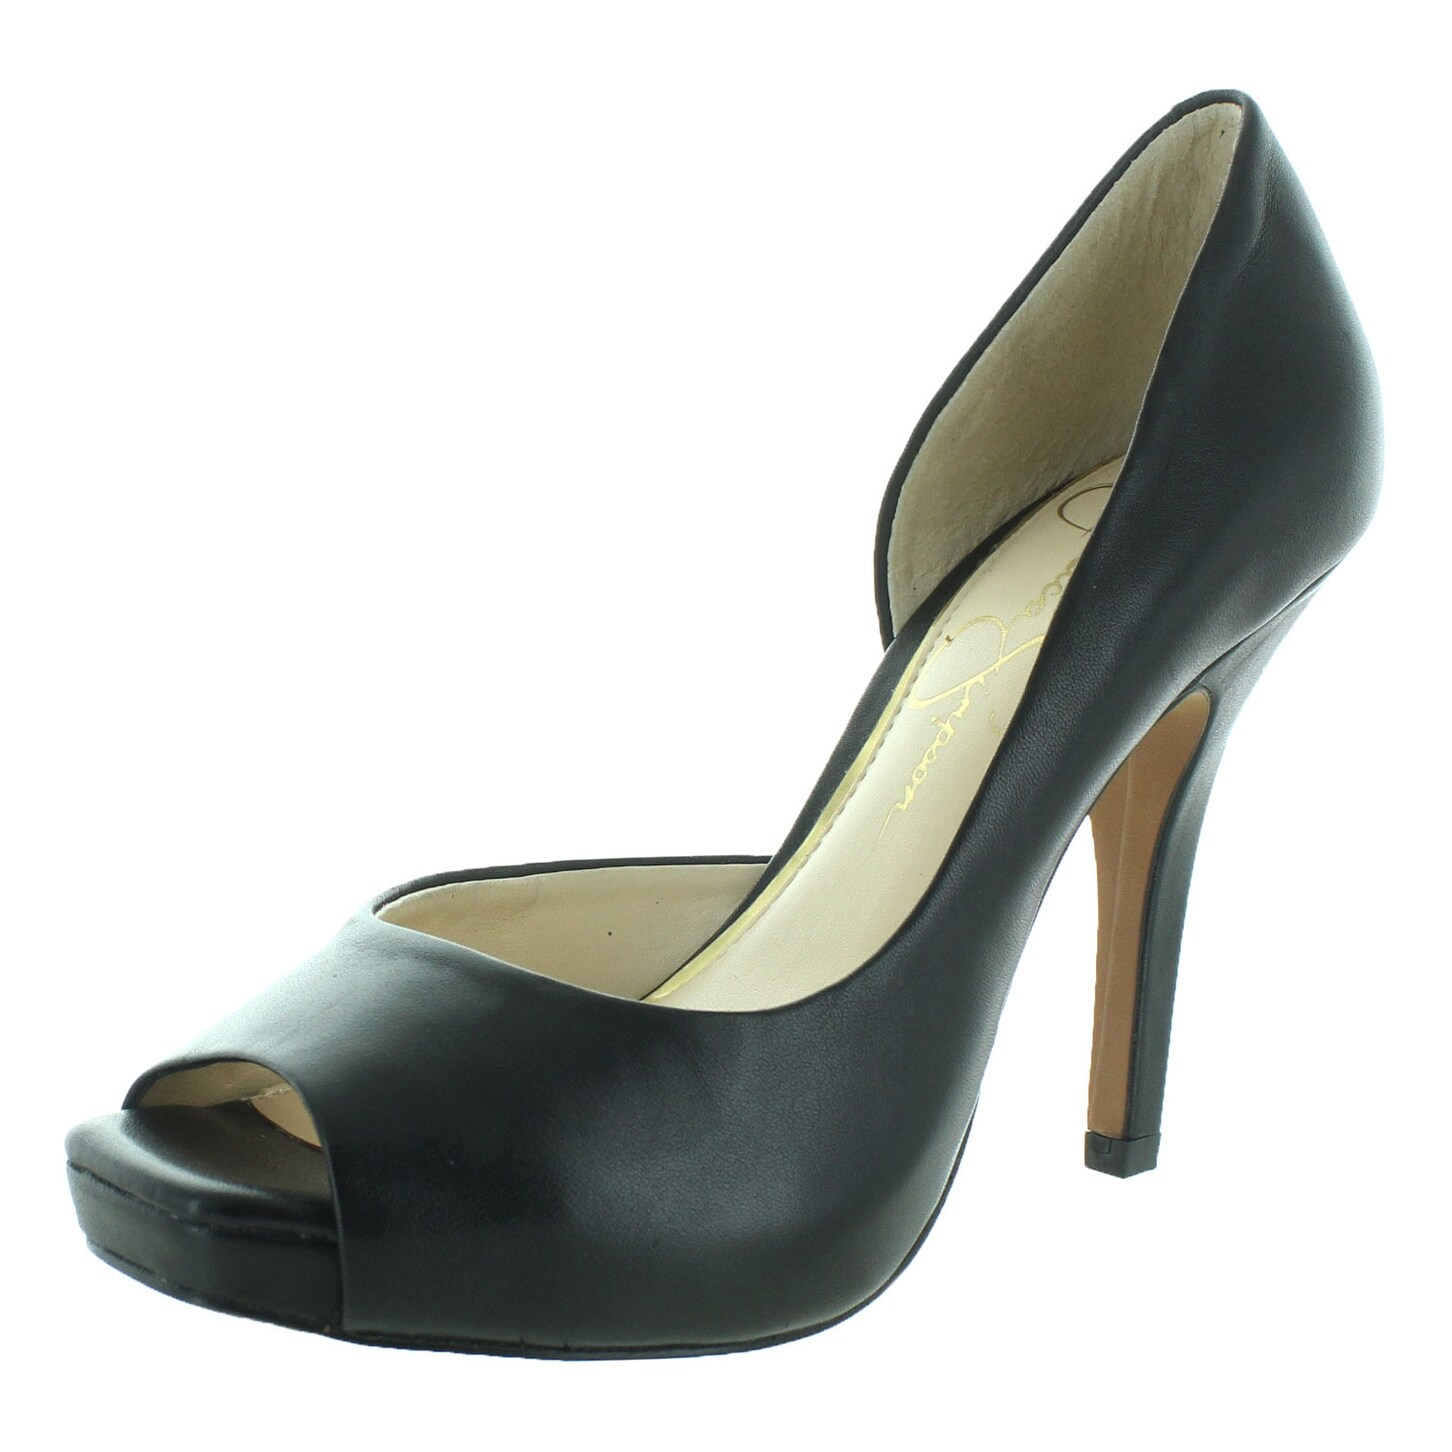 Jessica Simpson Josette D'Orsay Women's Open Toe Heels - Free Shipping On  Orders Over $45 - Overstock.com - 22529598